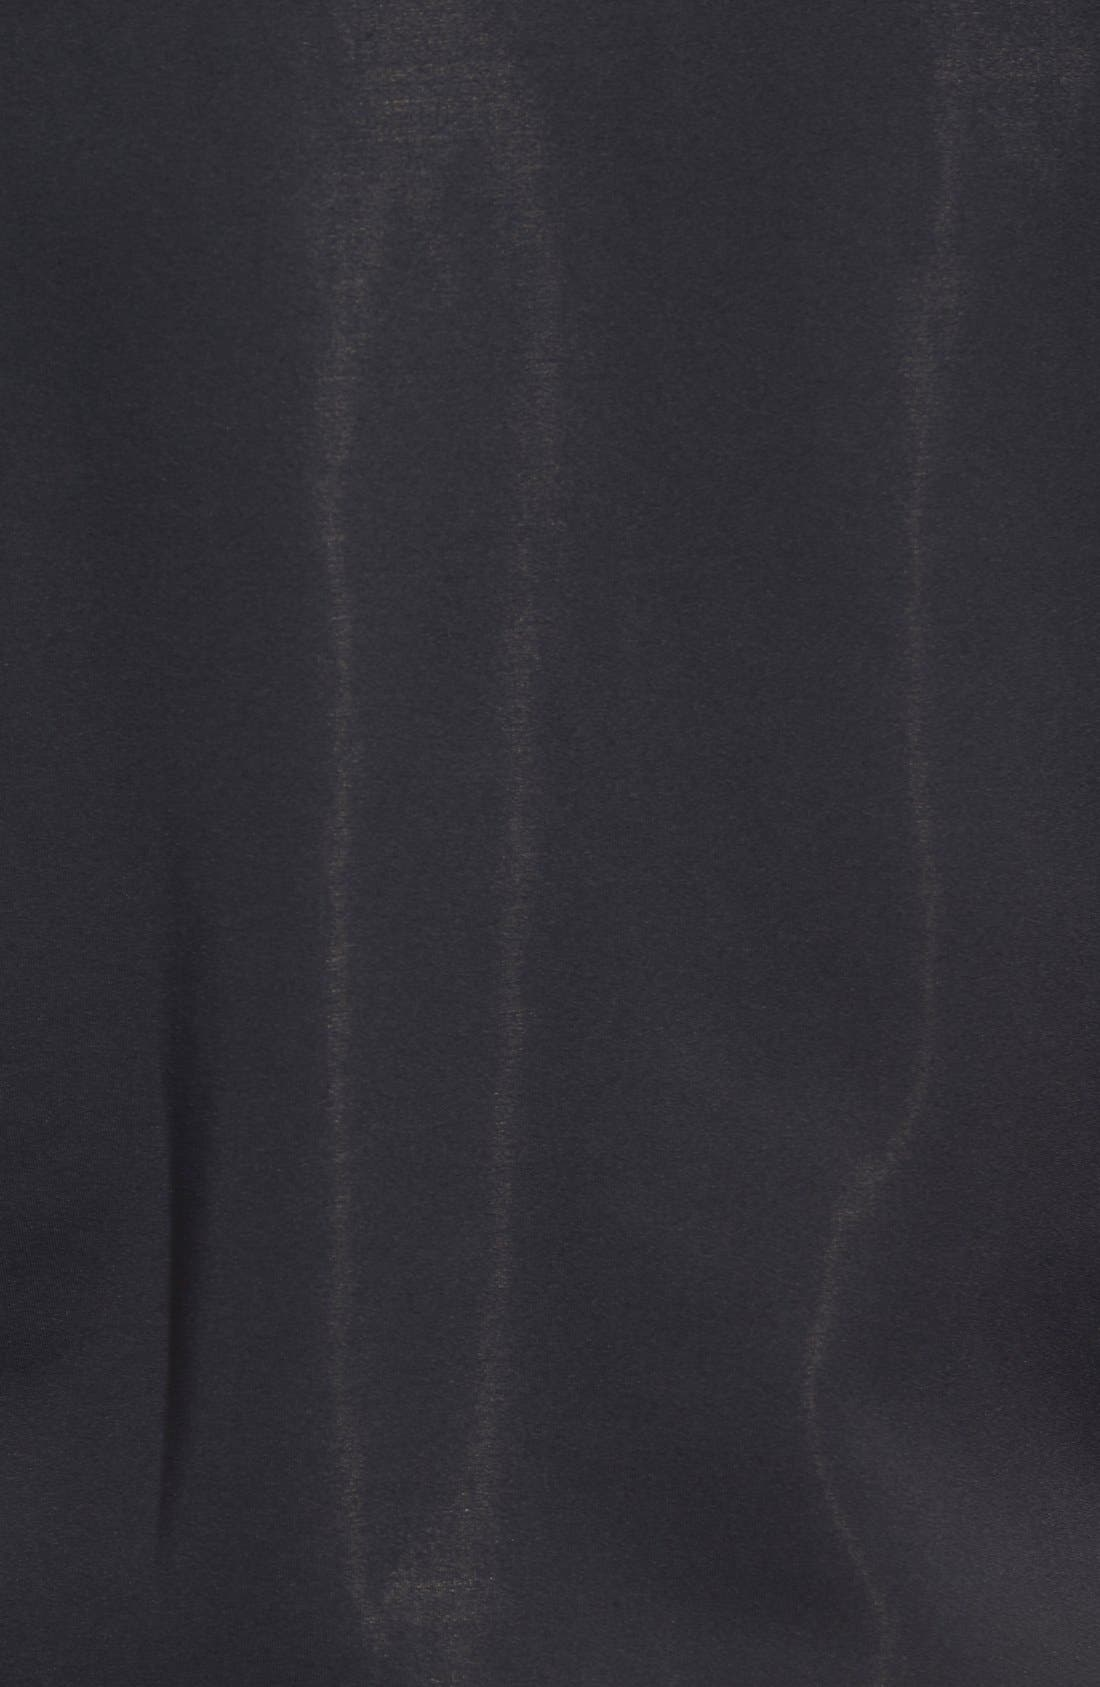 XH2O Crawford Stretch Quarter Zip Golf Vest,                             Alternate thumbnail 5, color,                             001